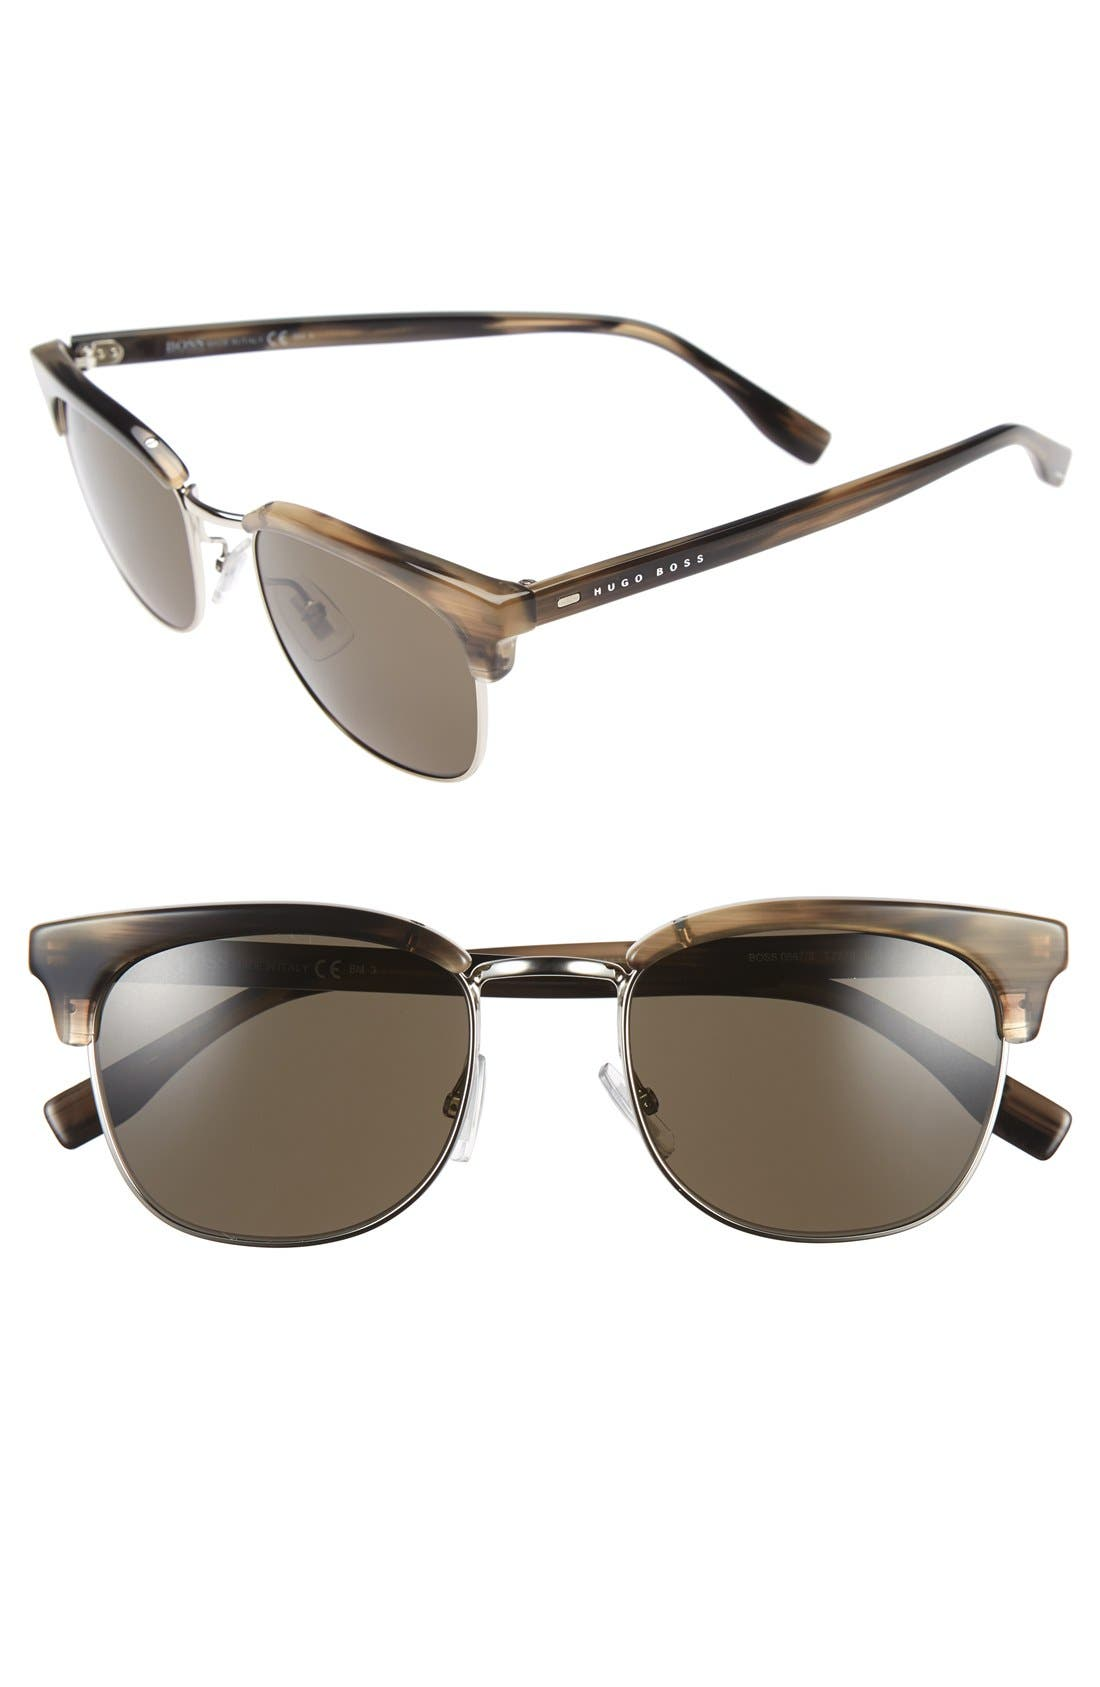 52mm Retro Sunglasses,                             Main thumbnail 1, color,                             BROWN HORN/ SILVER/ DARK BROWN